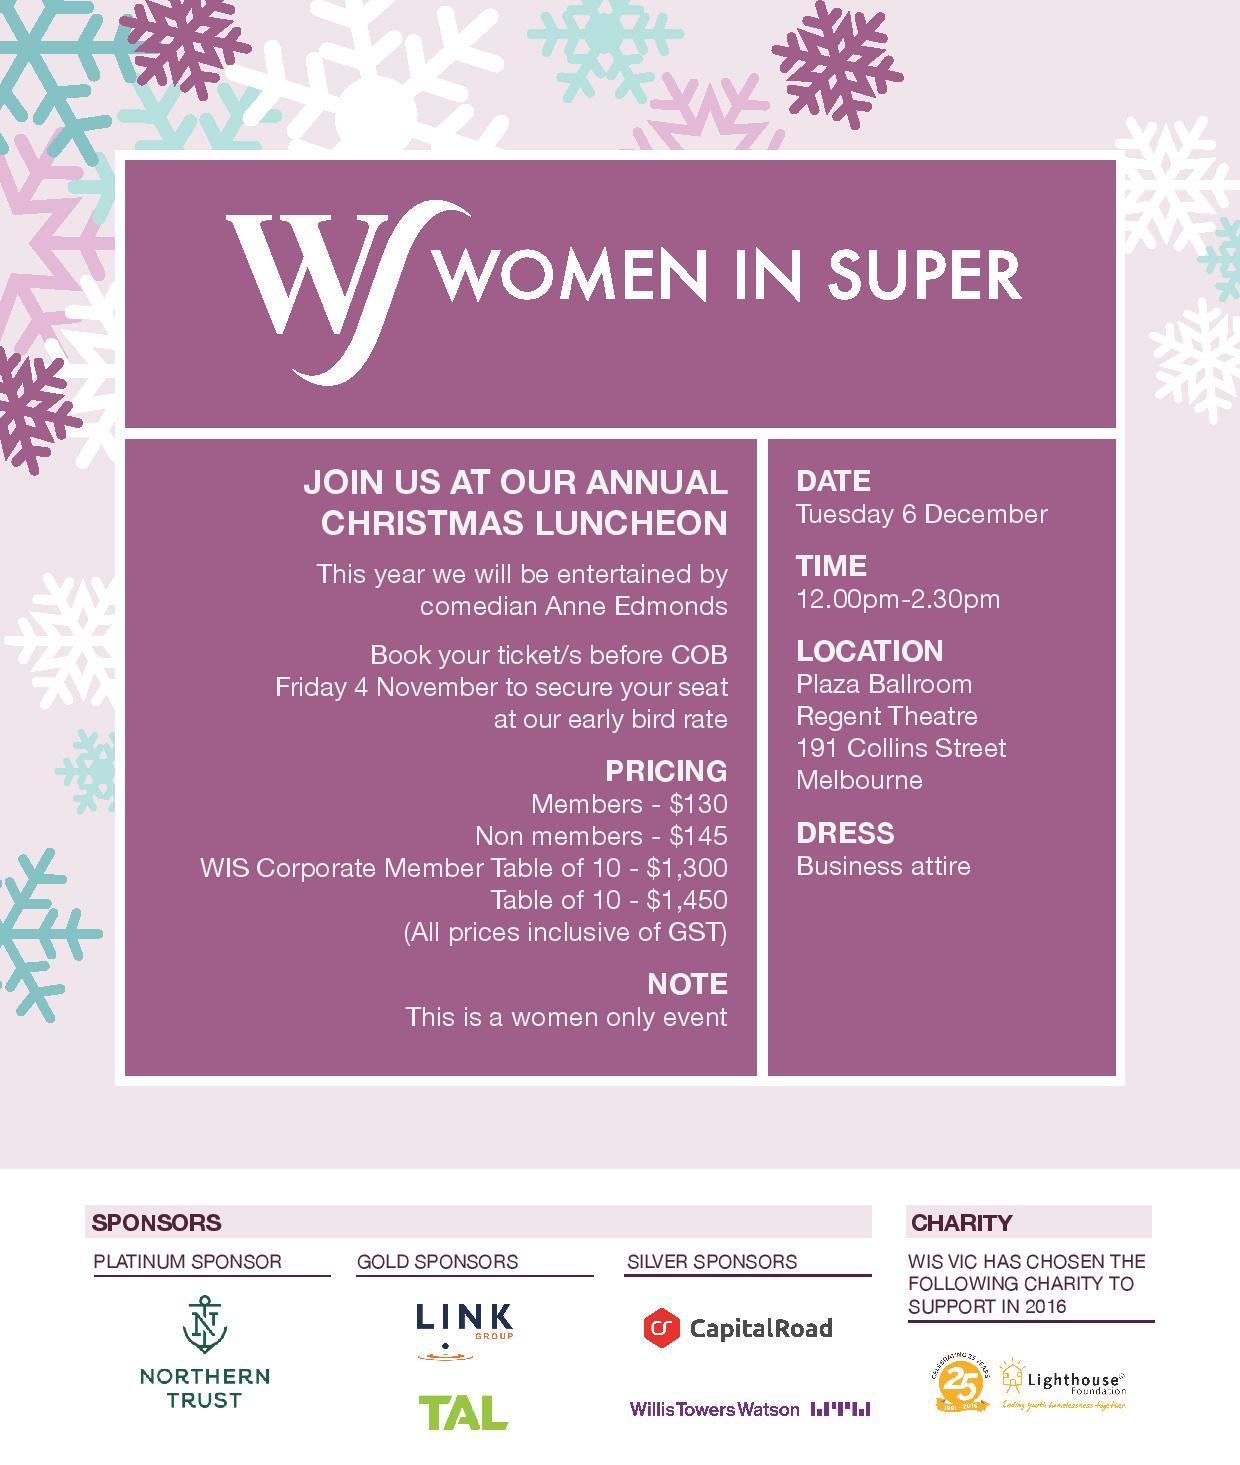 women in super vic christmas luncheon 2016 women in super